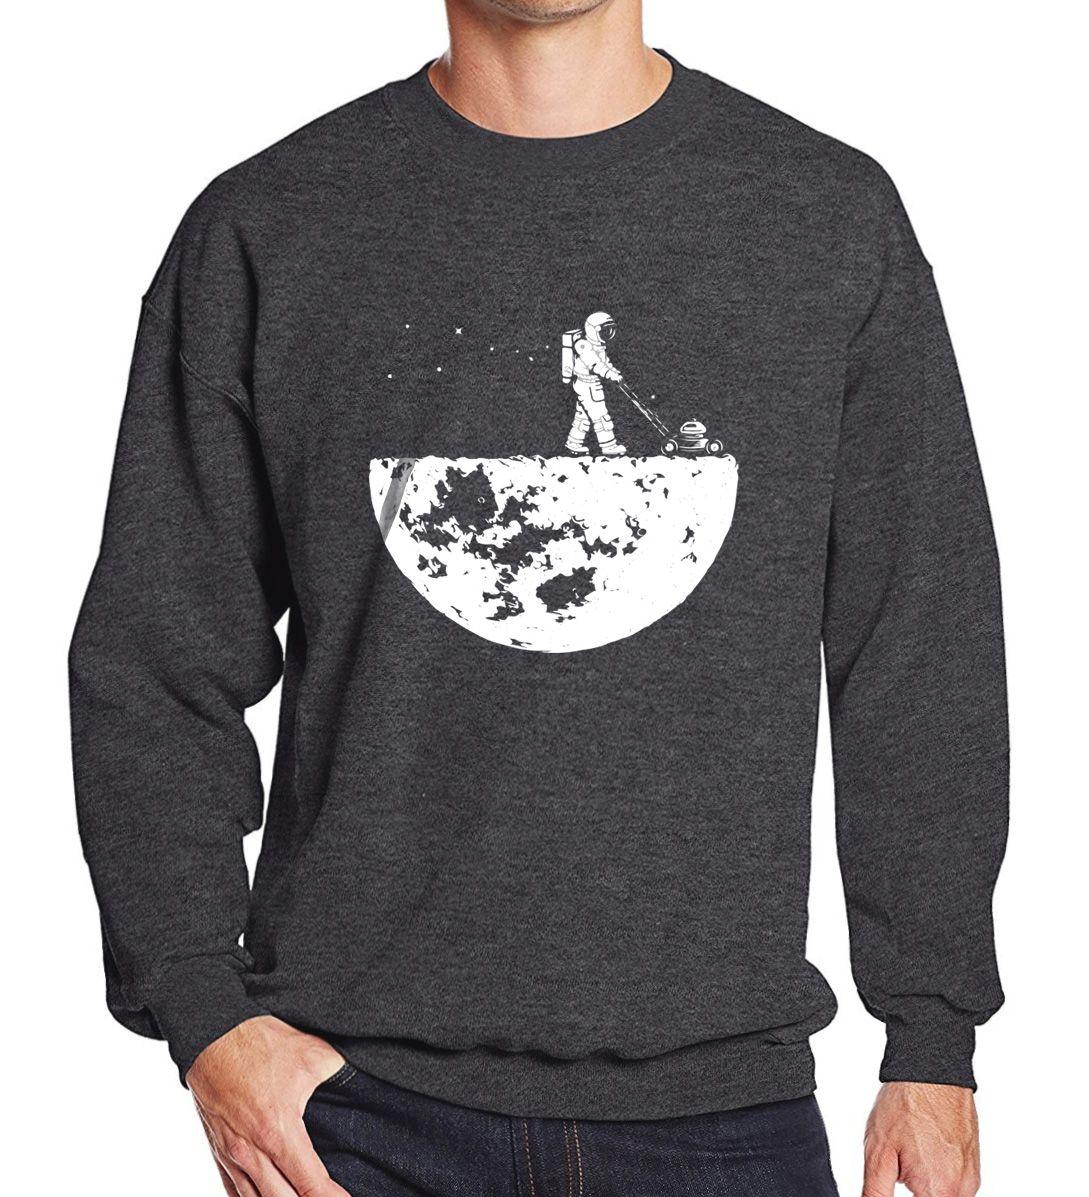 Hot sale 2017 men sweatshirts autumn winter fleece print HanHent Develop The Moon fashion casual men's sportswear hoody harajuku